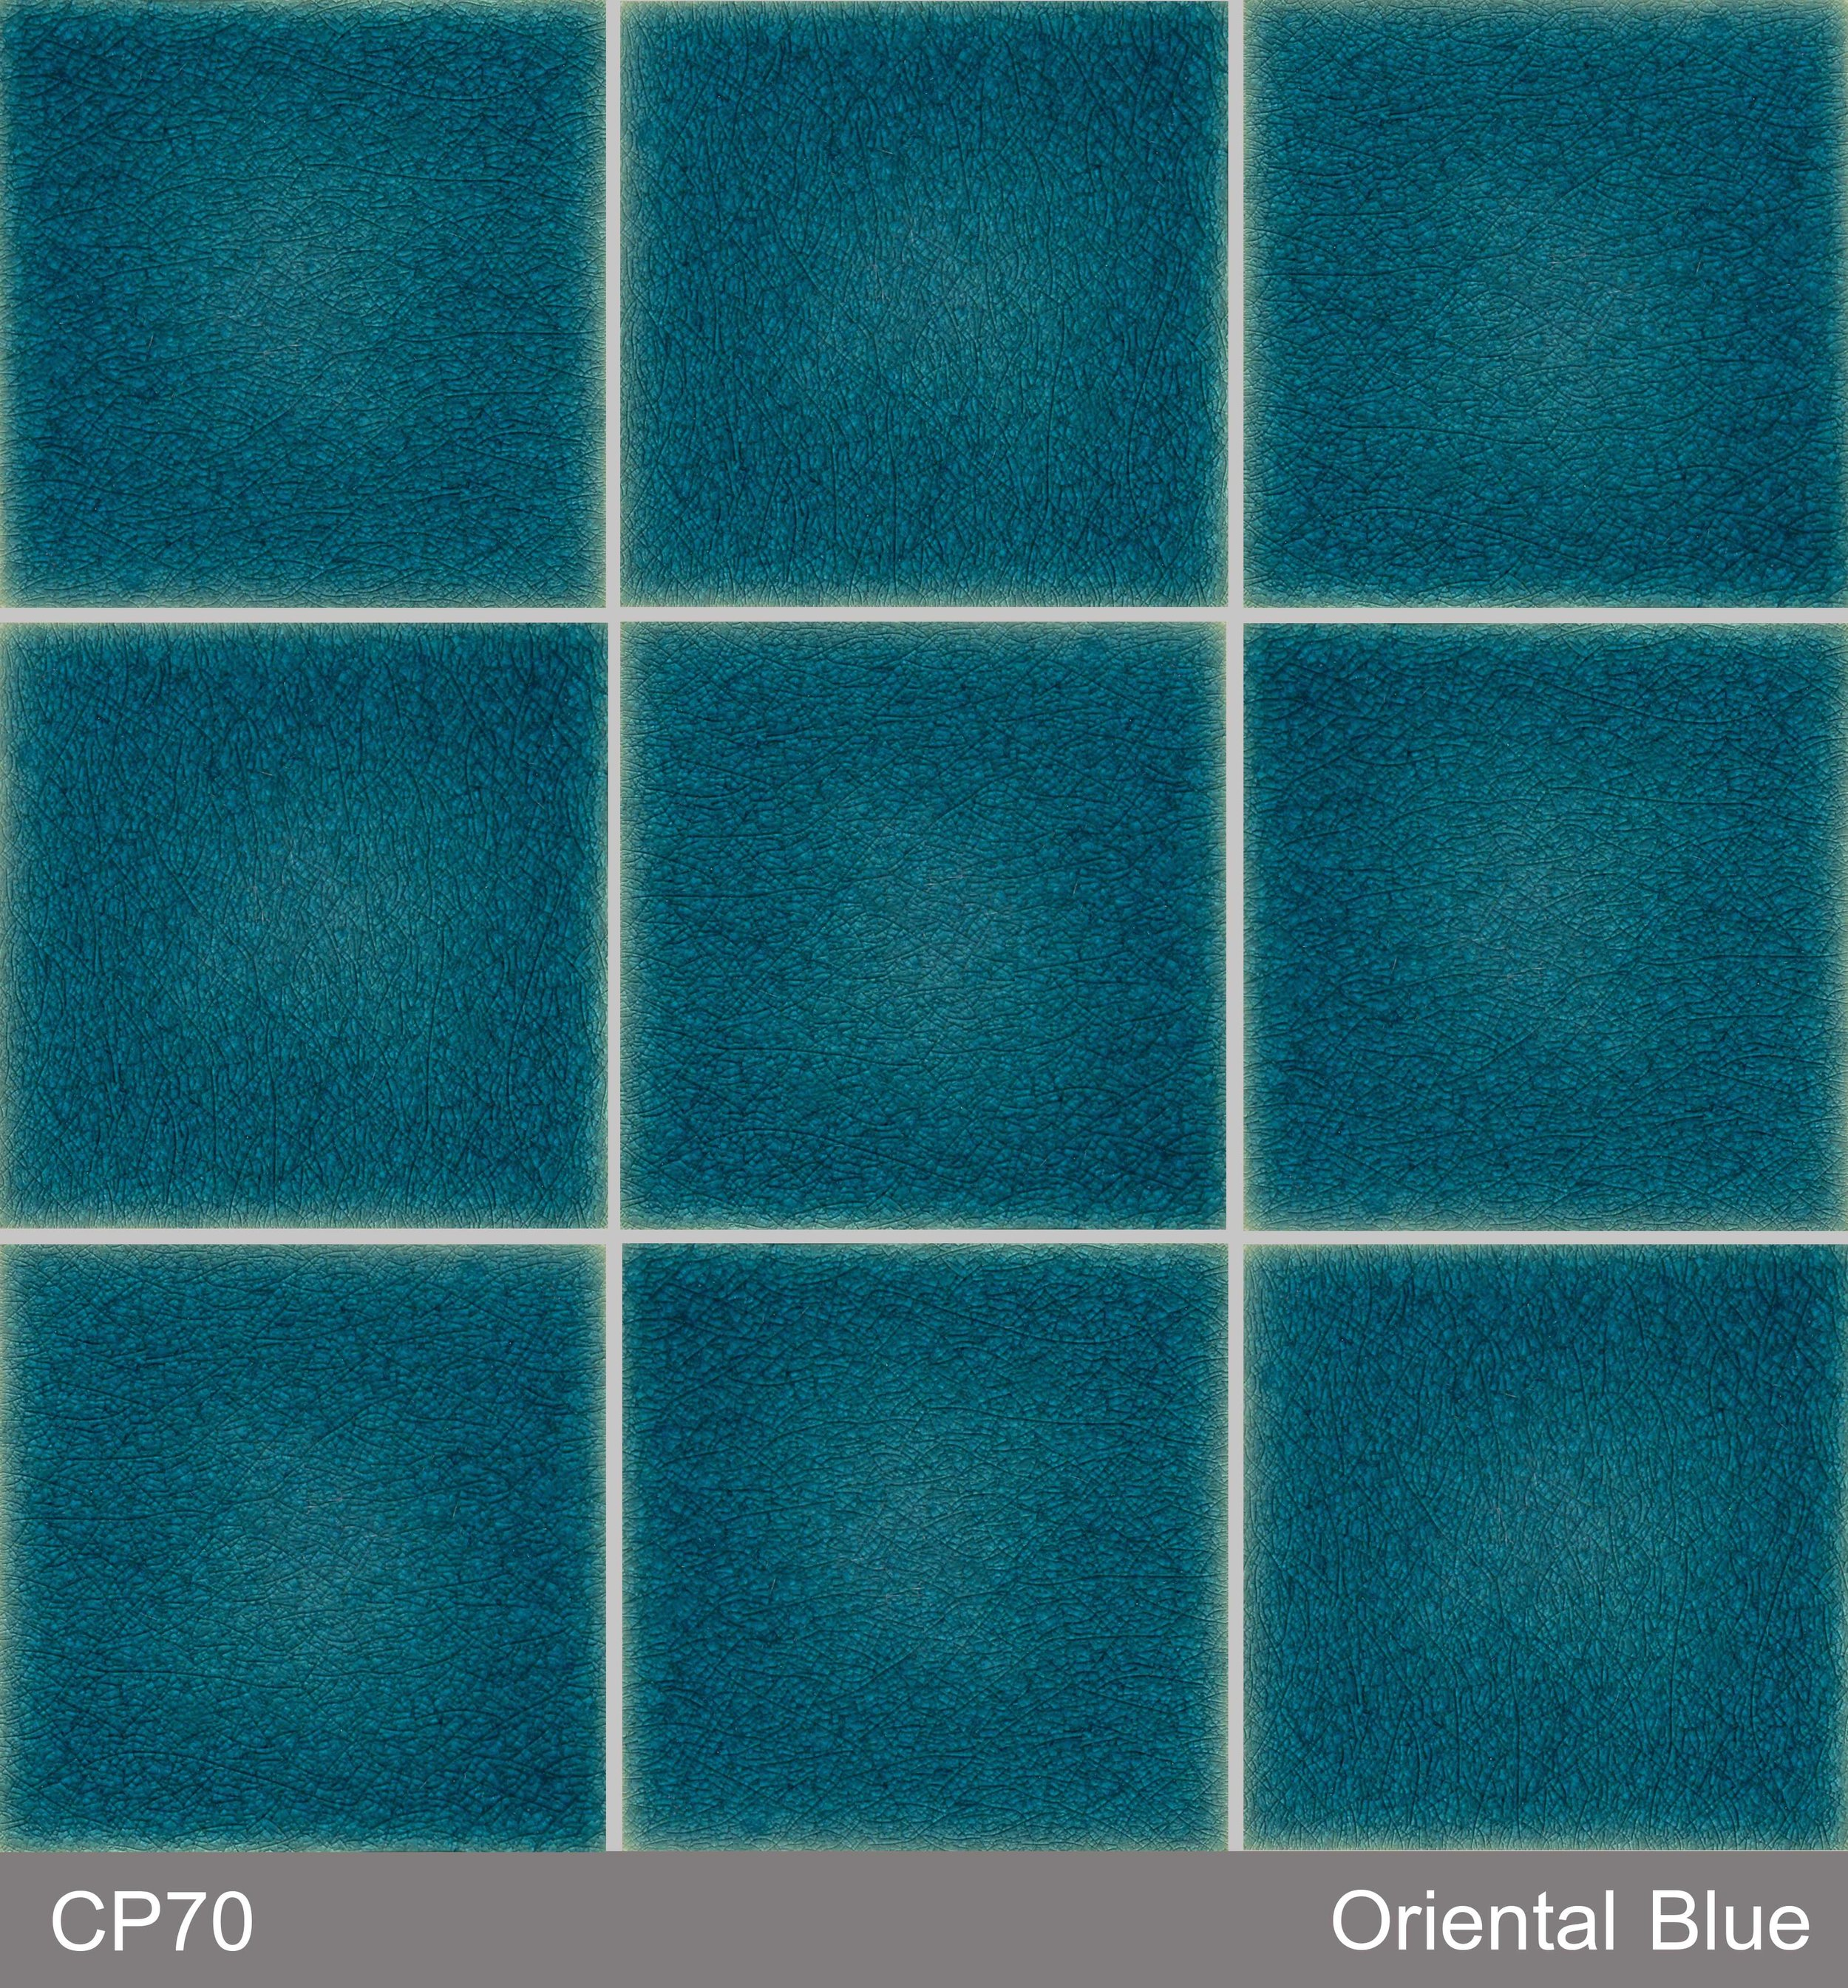 CP70 : Oriental blue